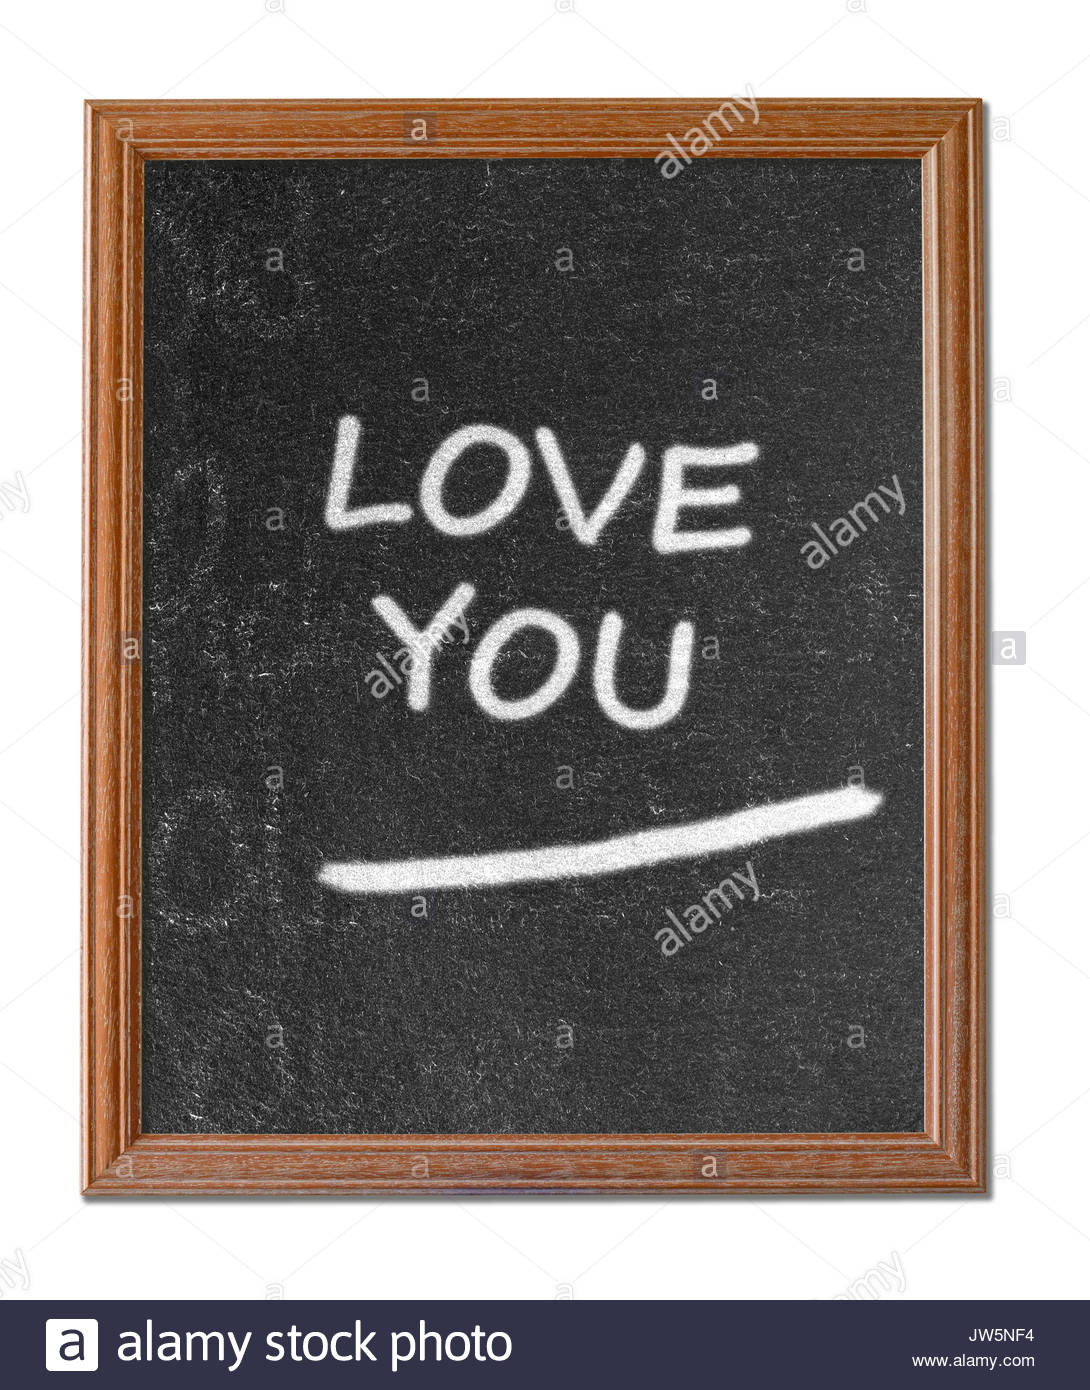 Love you written on a blackboard, Blandford, Dorset, England, UK - Stock Image